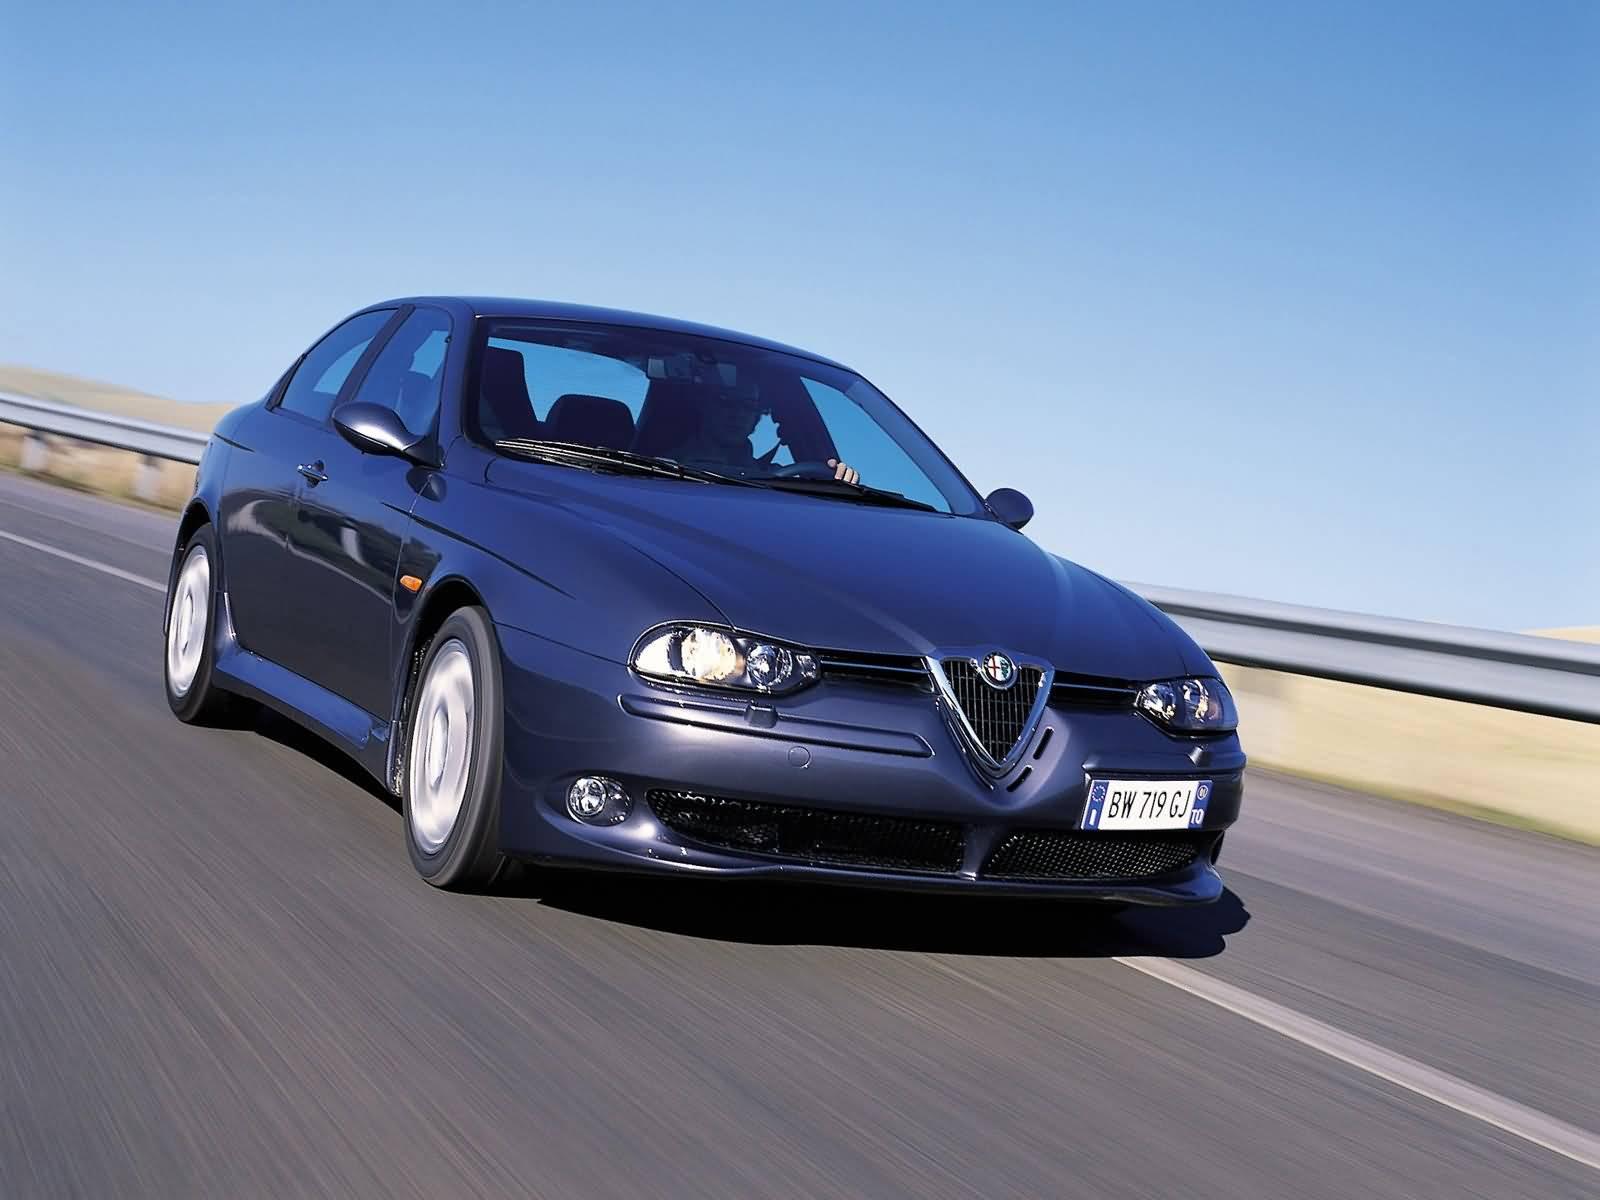 Very fast on the road of Alfa Romeo 156 GTA Car